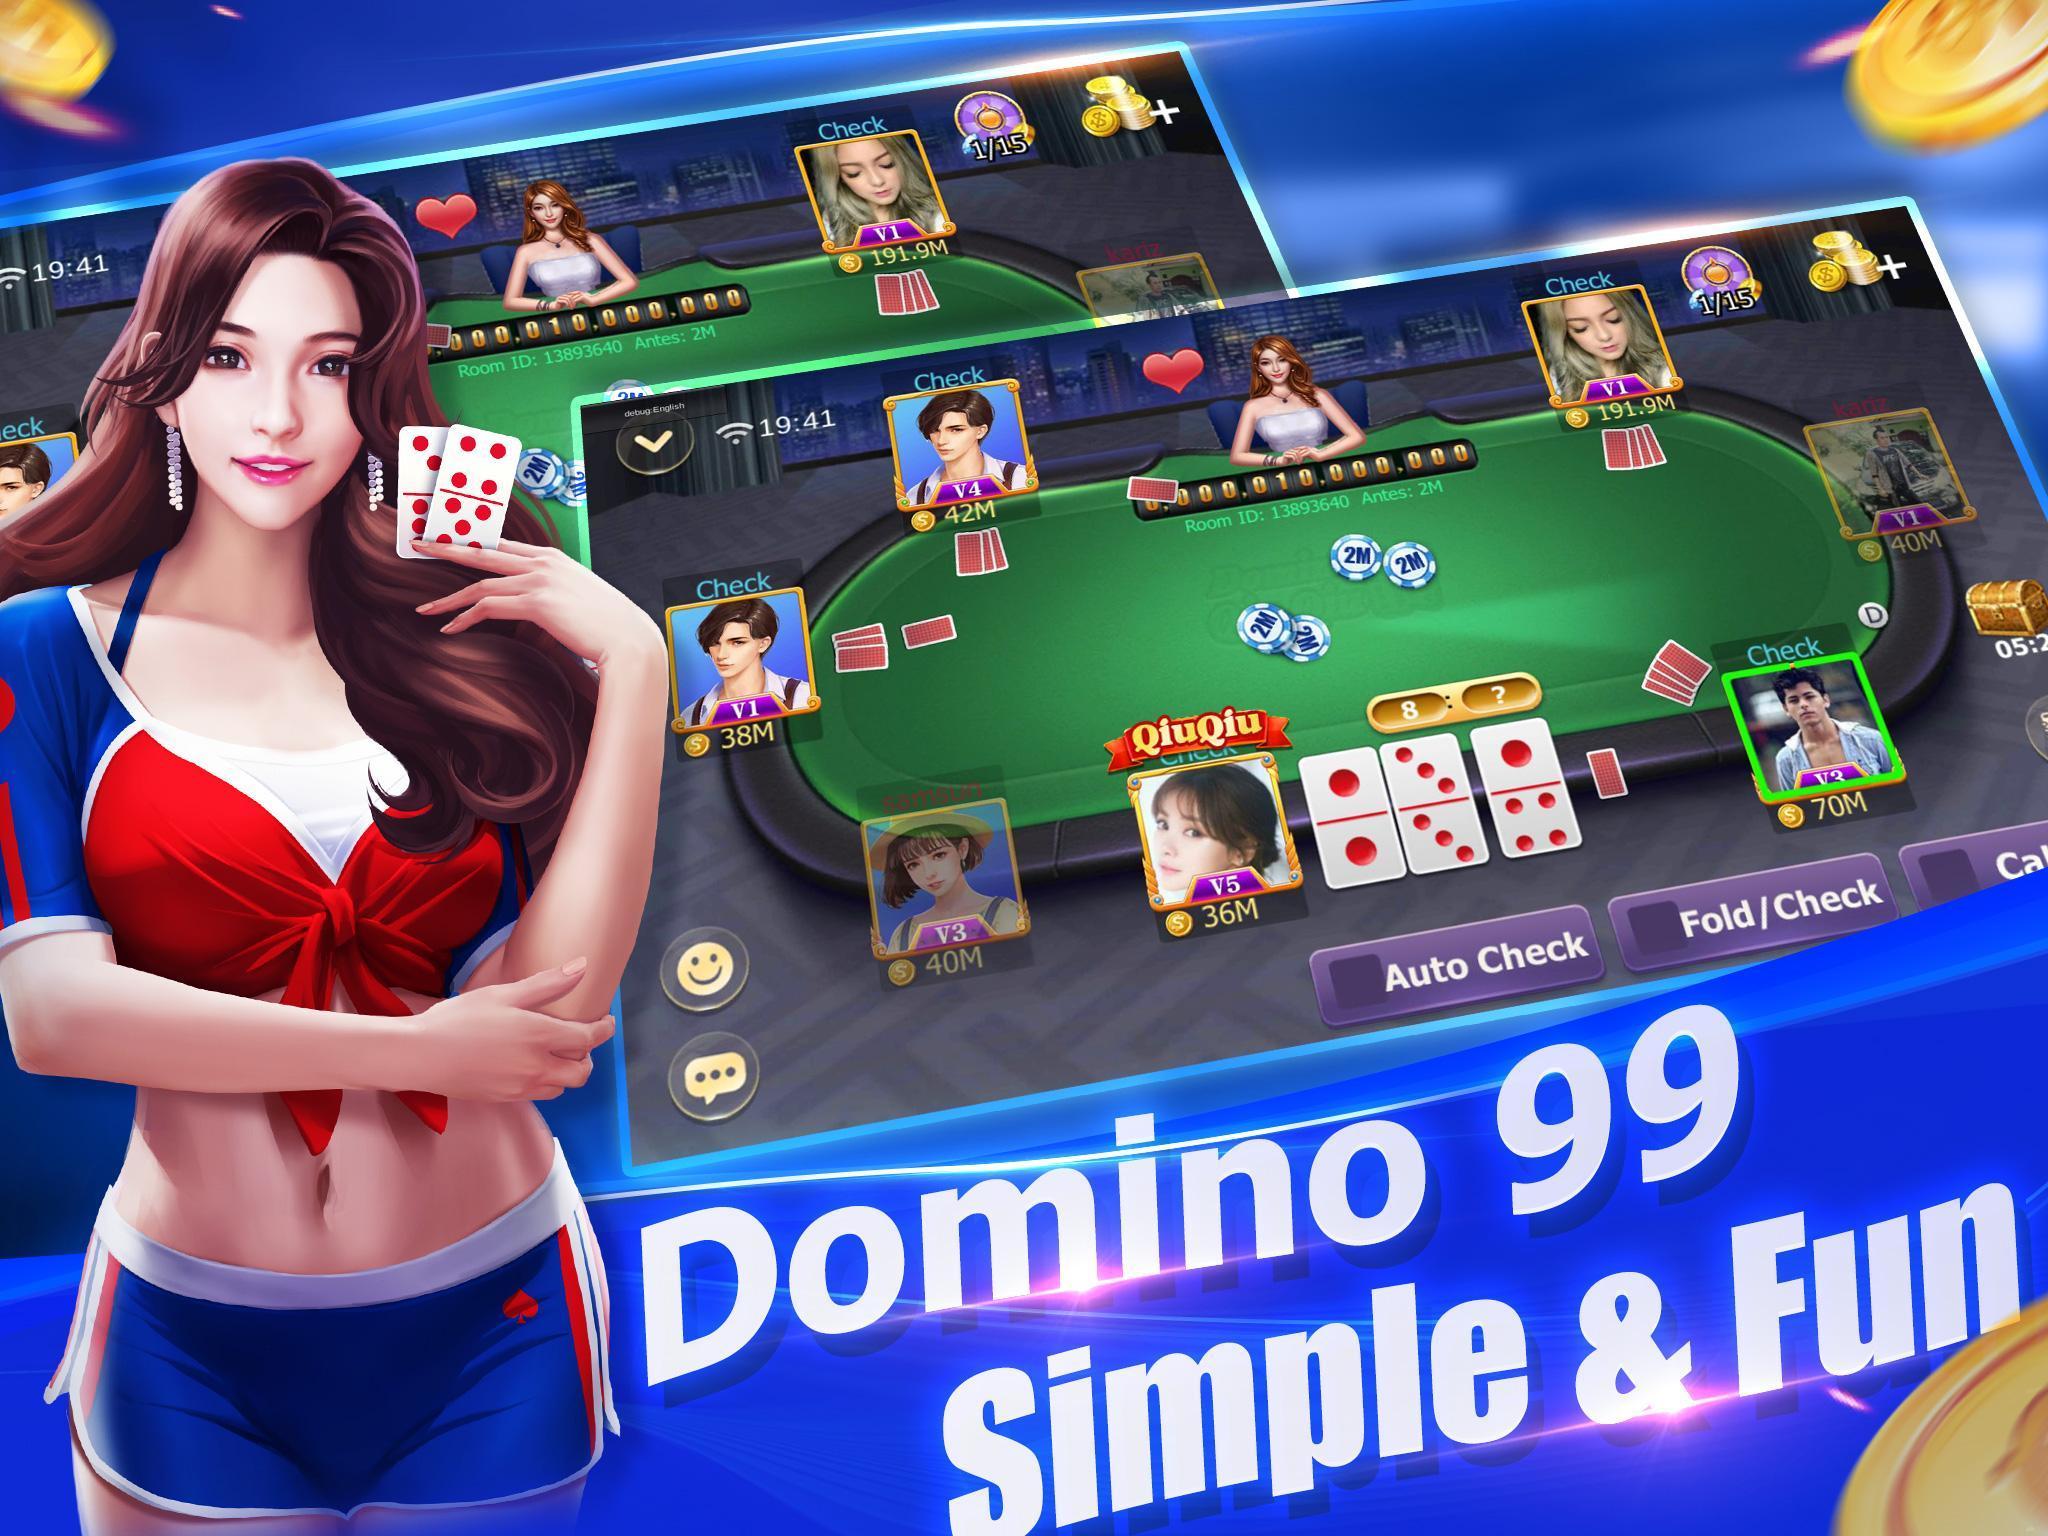 Domino Qiuqiu 99 Kiukiu Free Domino Games For Android Apk Download